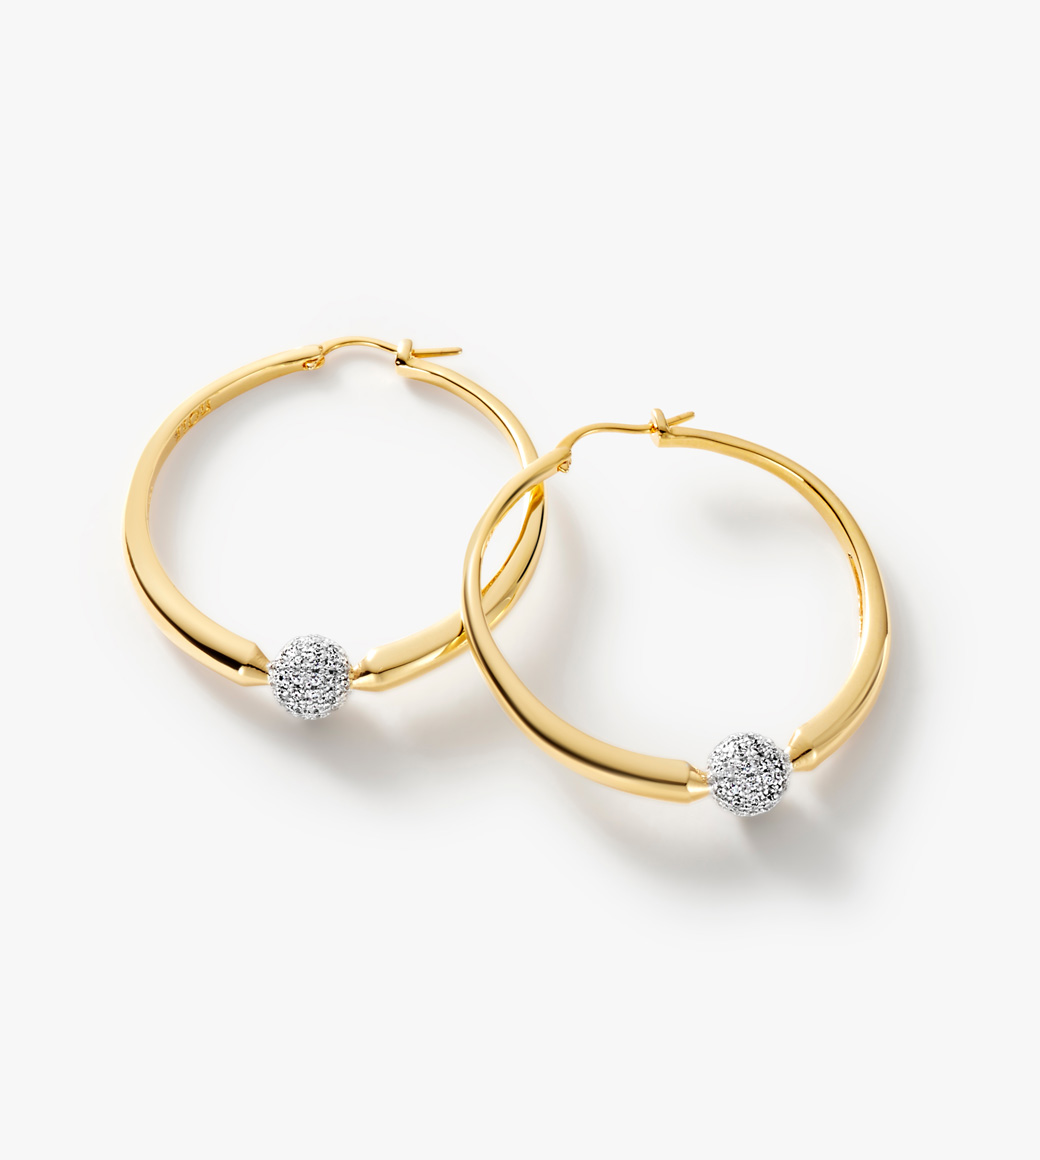 fashion jewelry stylish hoop earrings opfuqsw